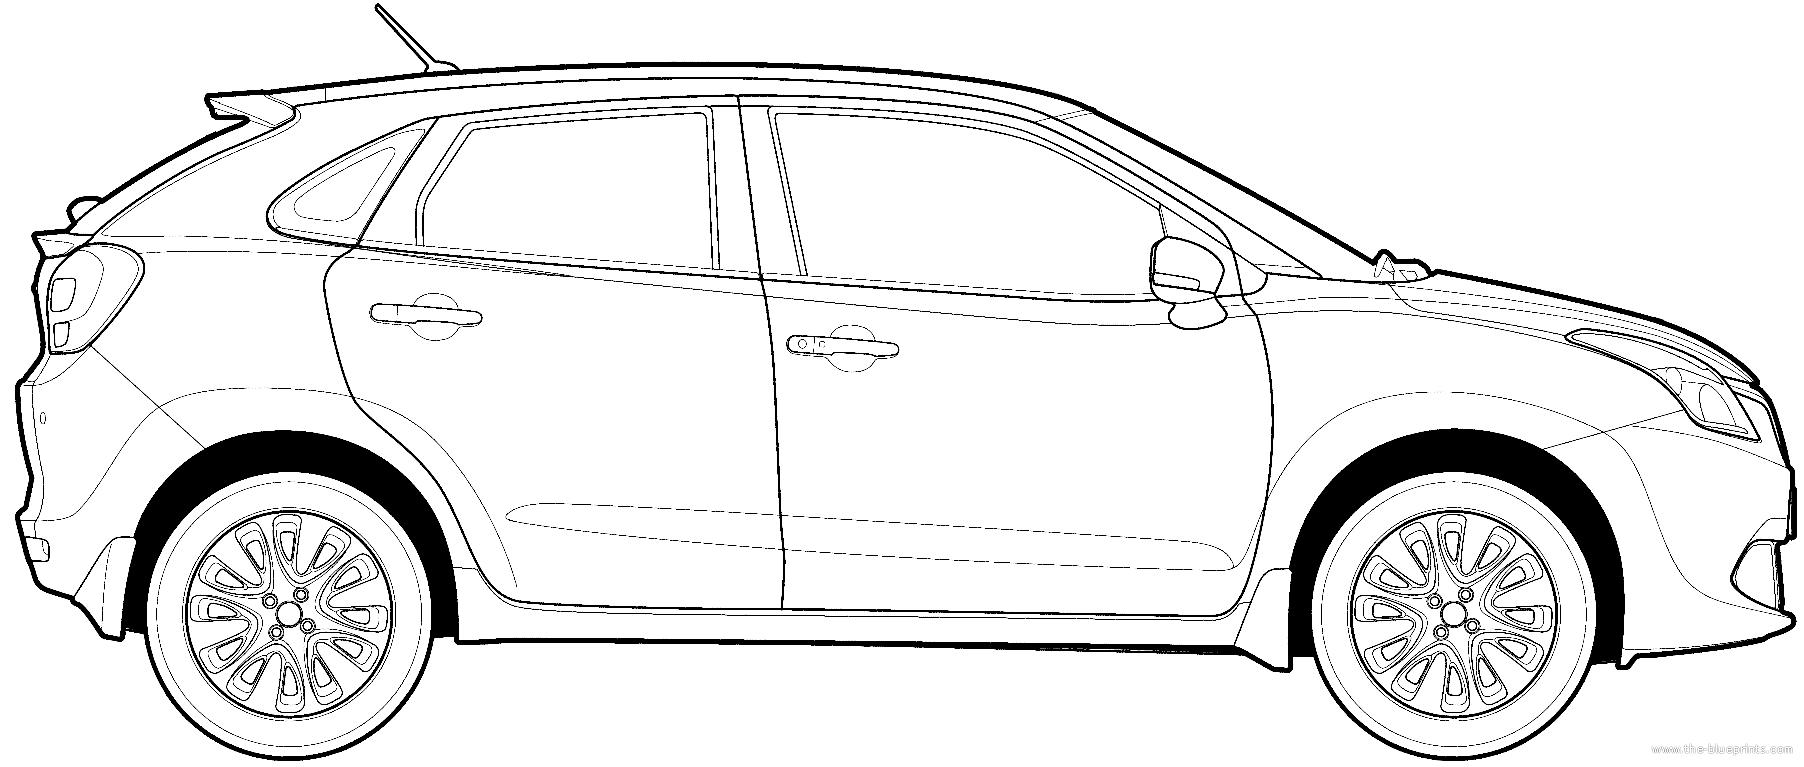 .com - Blueprints > Cars > Various Cars > Maruti Suzuki Baleno (2015